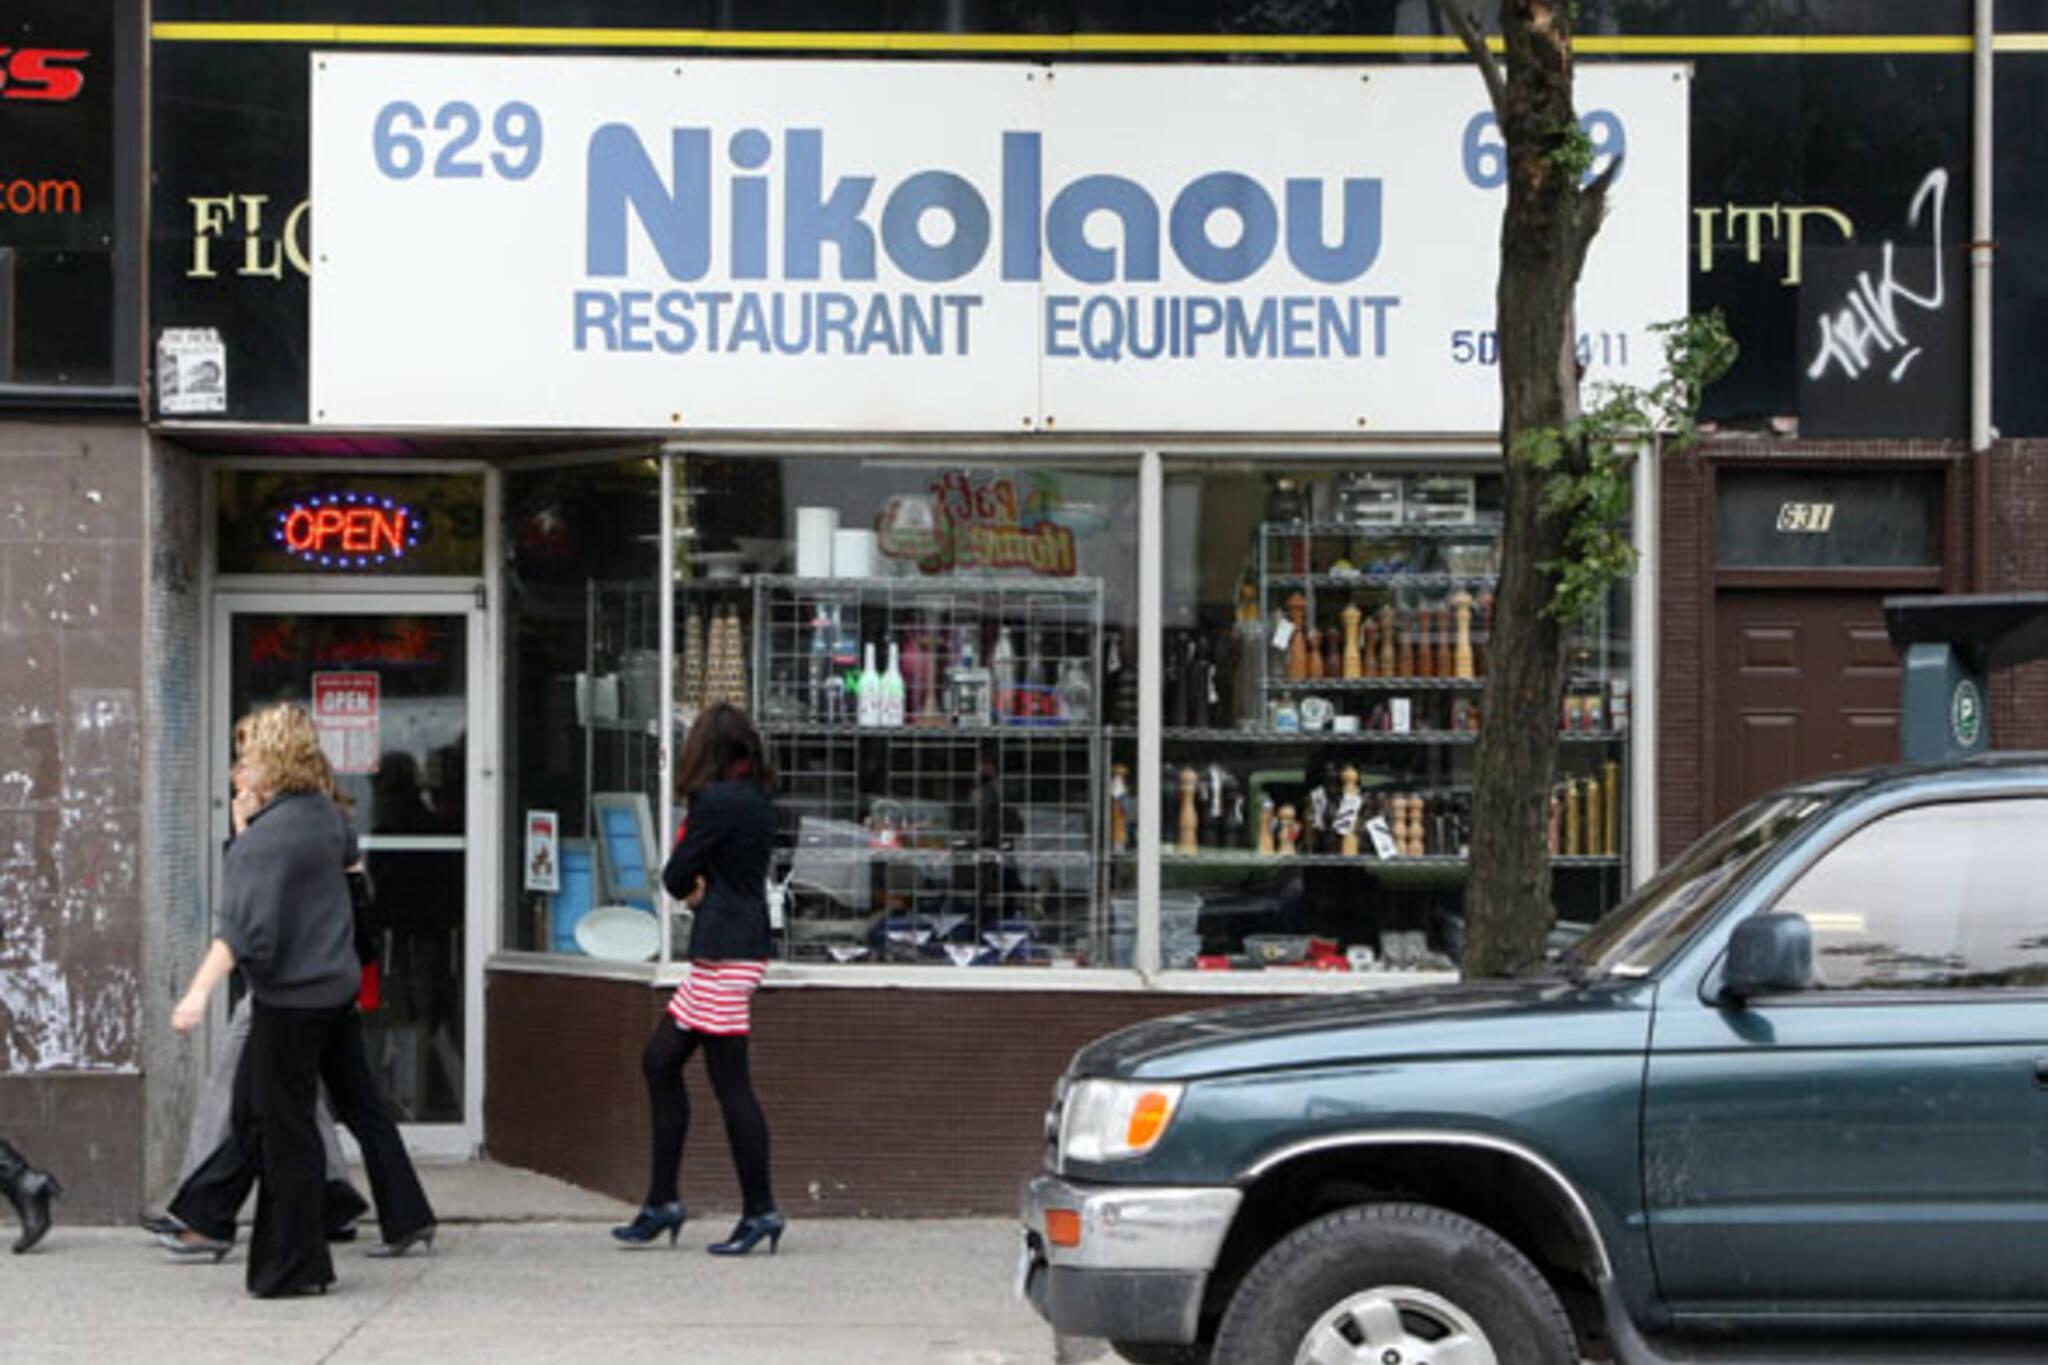 Nikolaou Restaurant Equipment